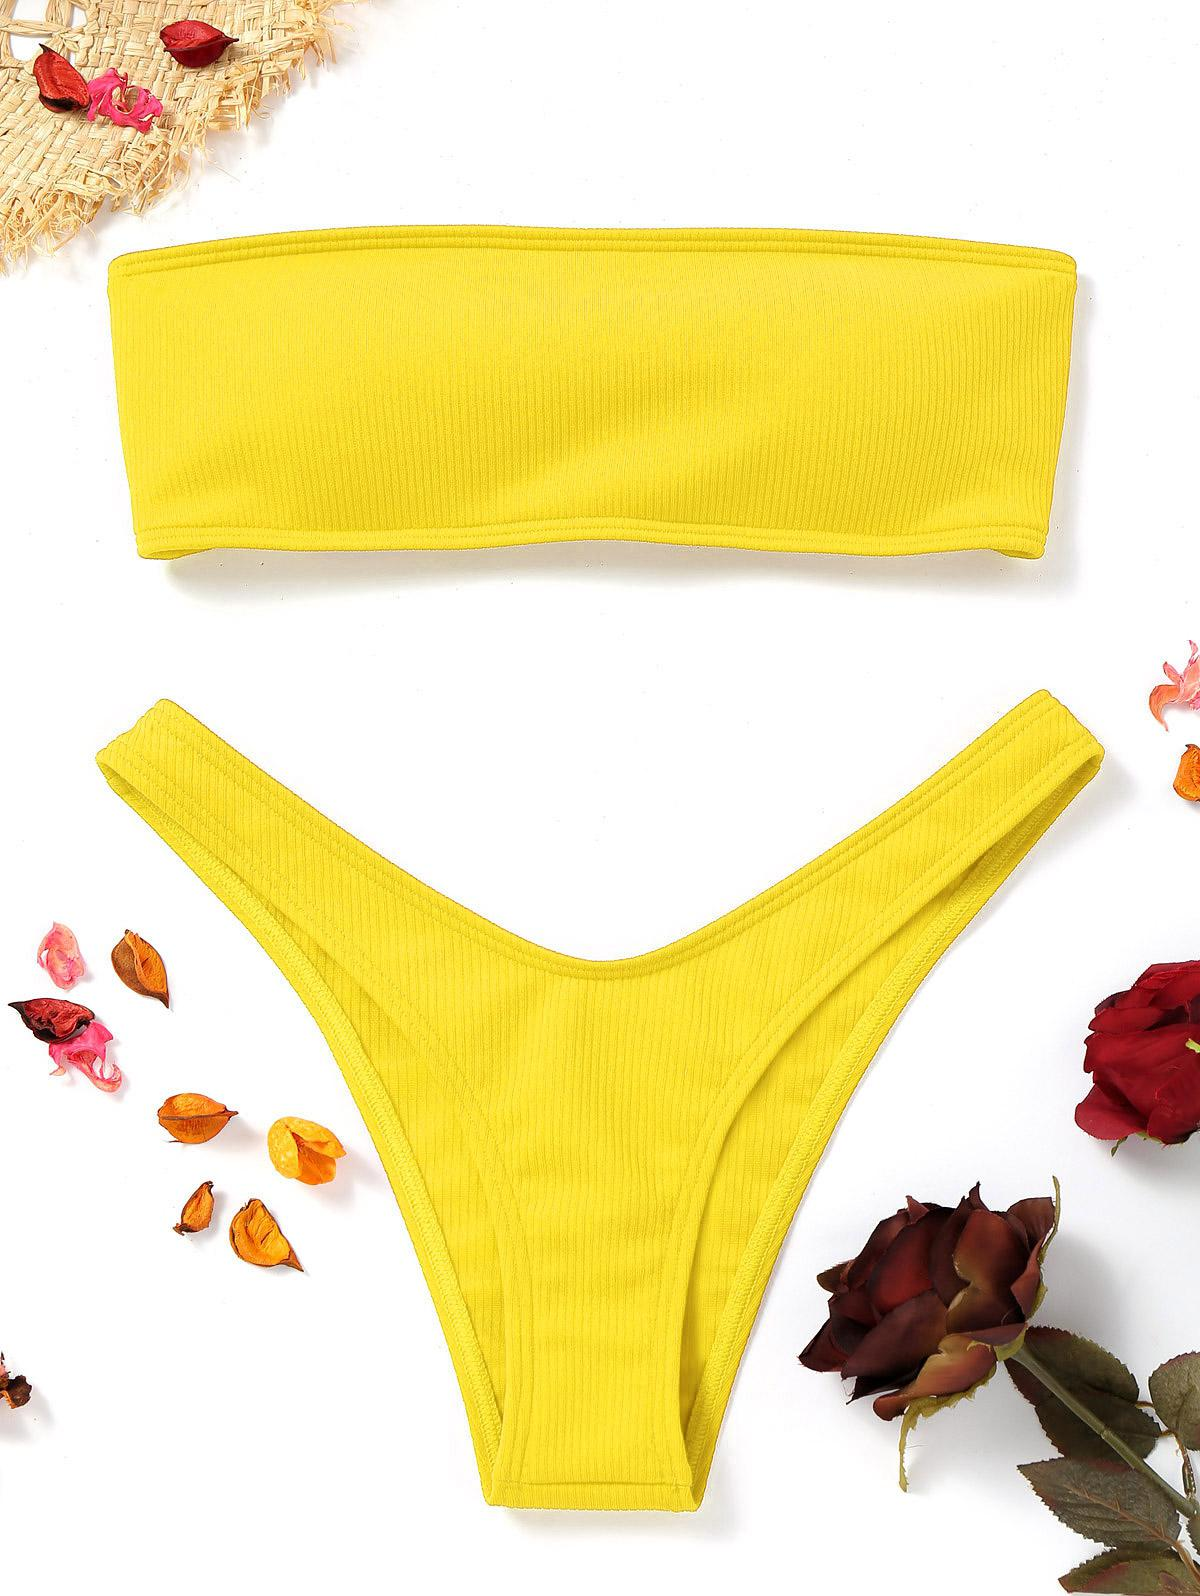 Zaful coupon: High Cut Ribbed Bandeau Bikini Set